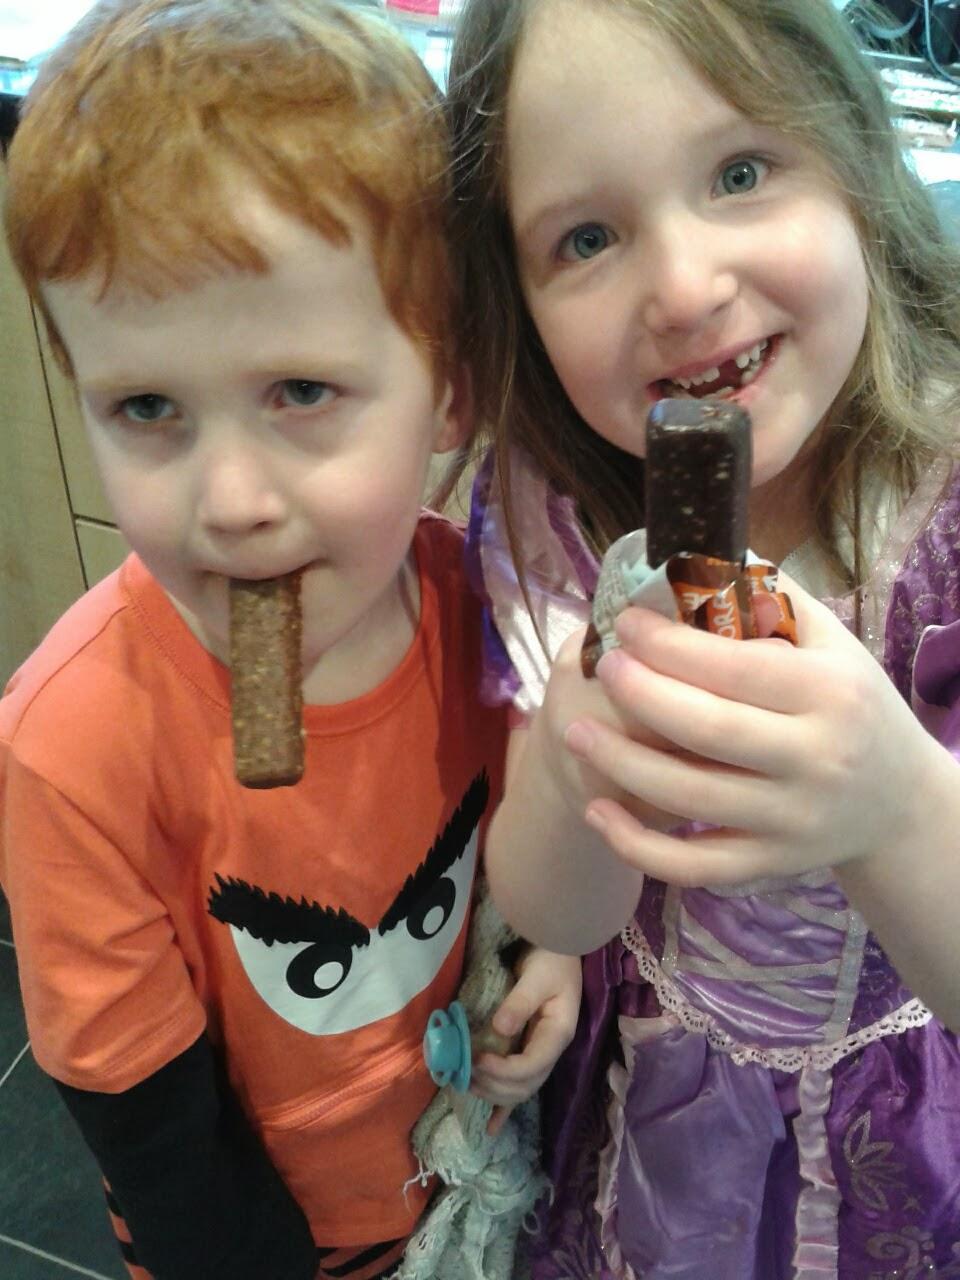 Caitlin and Ieuan testing Nakd snack bars